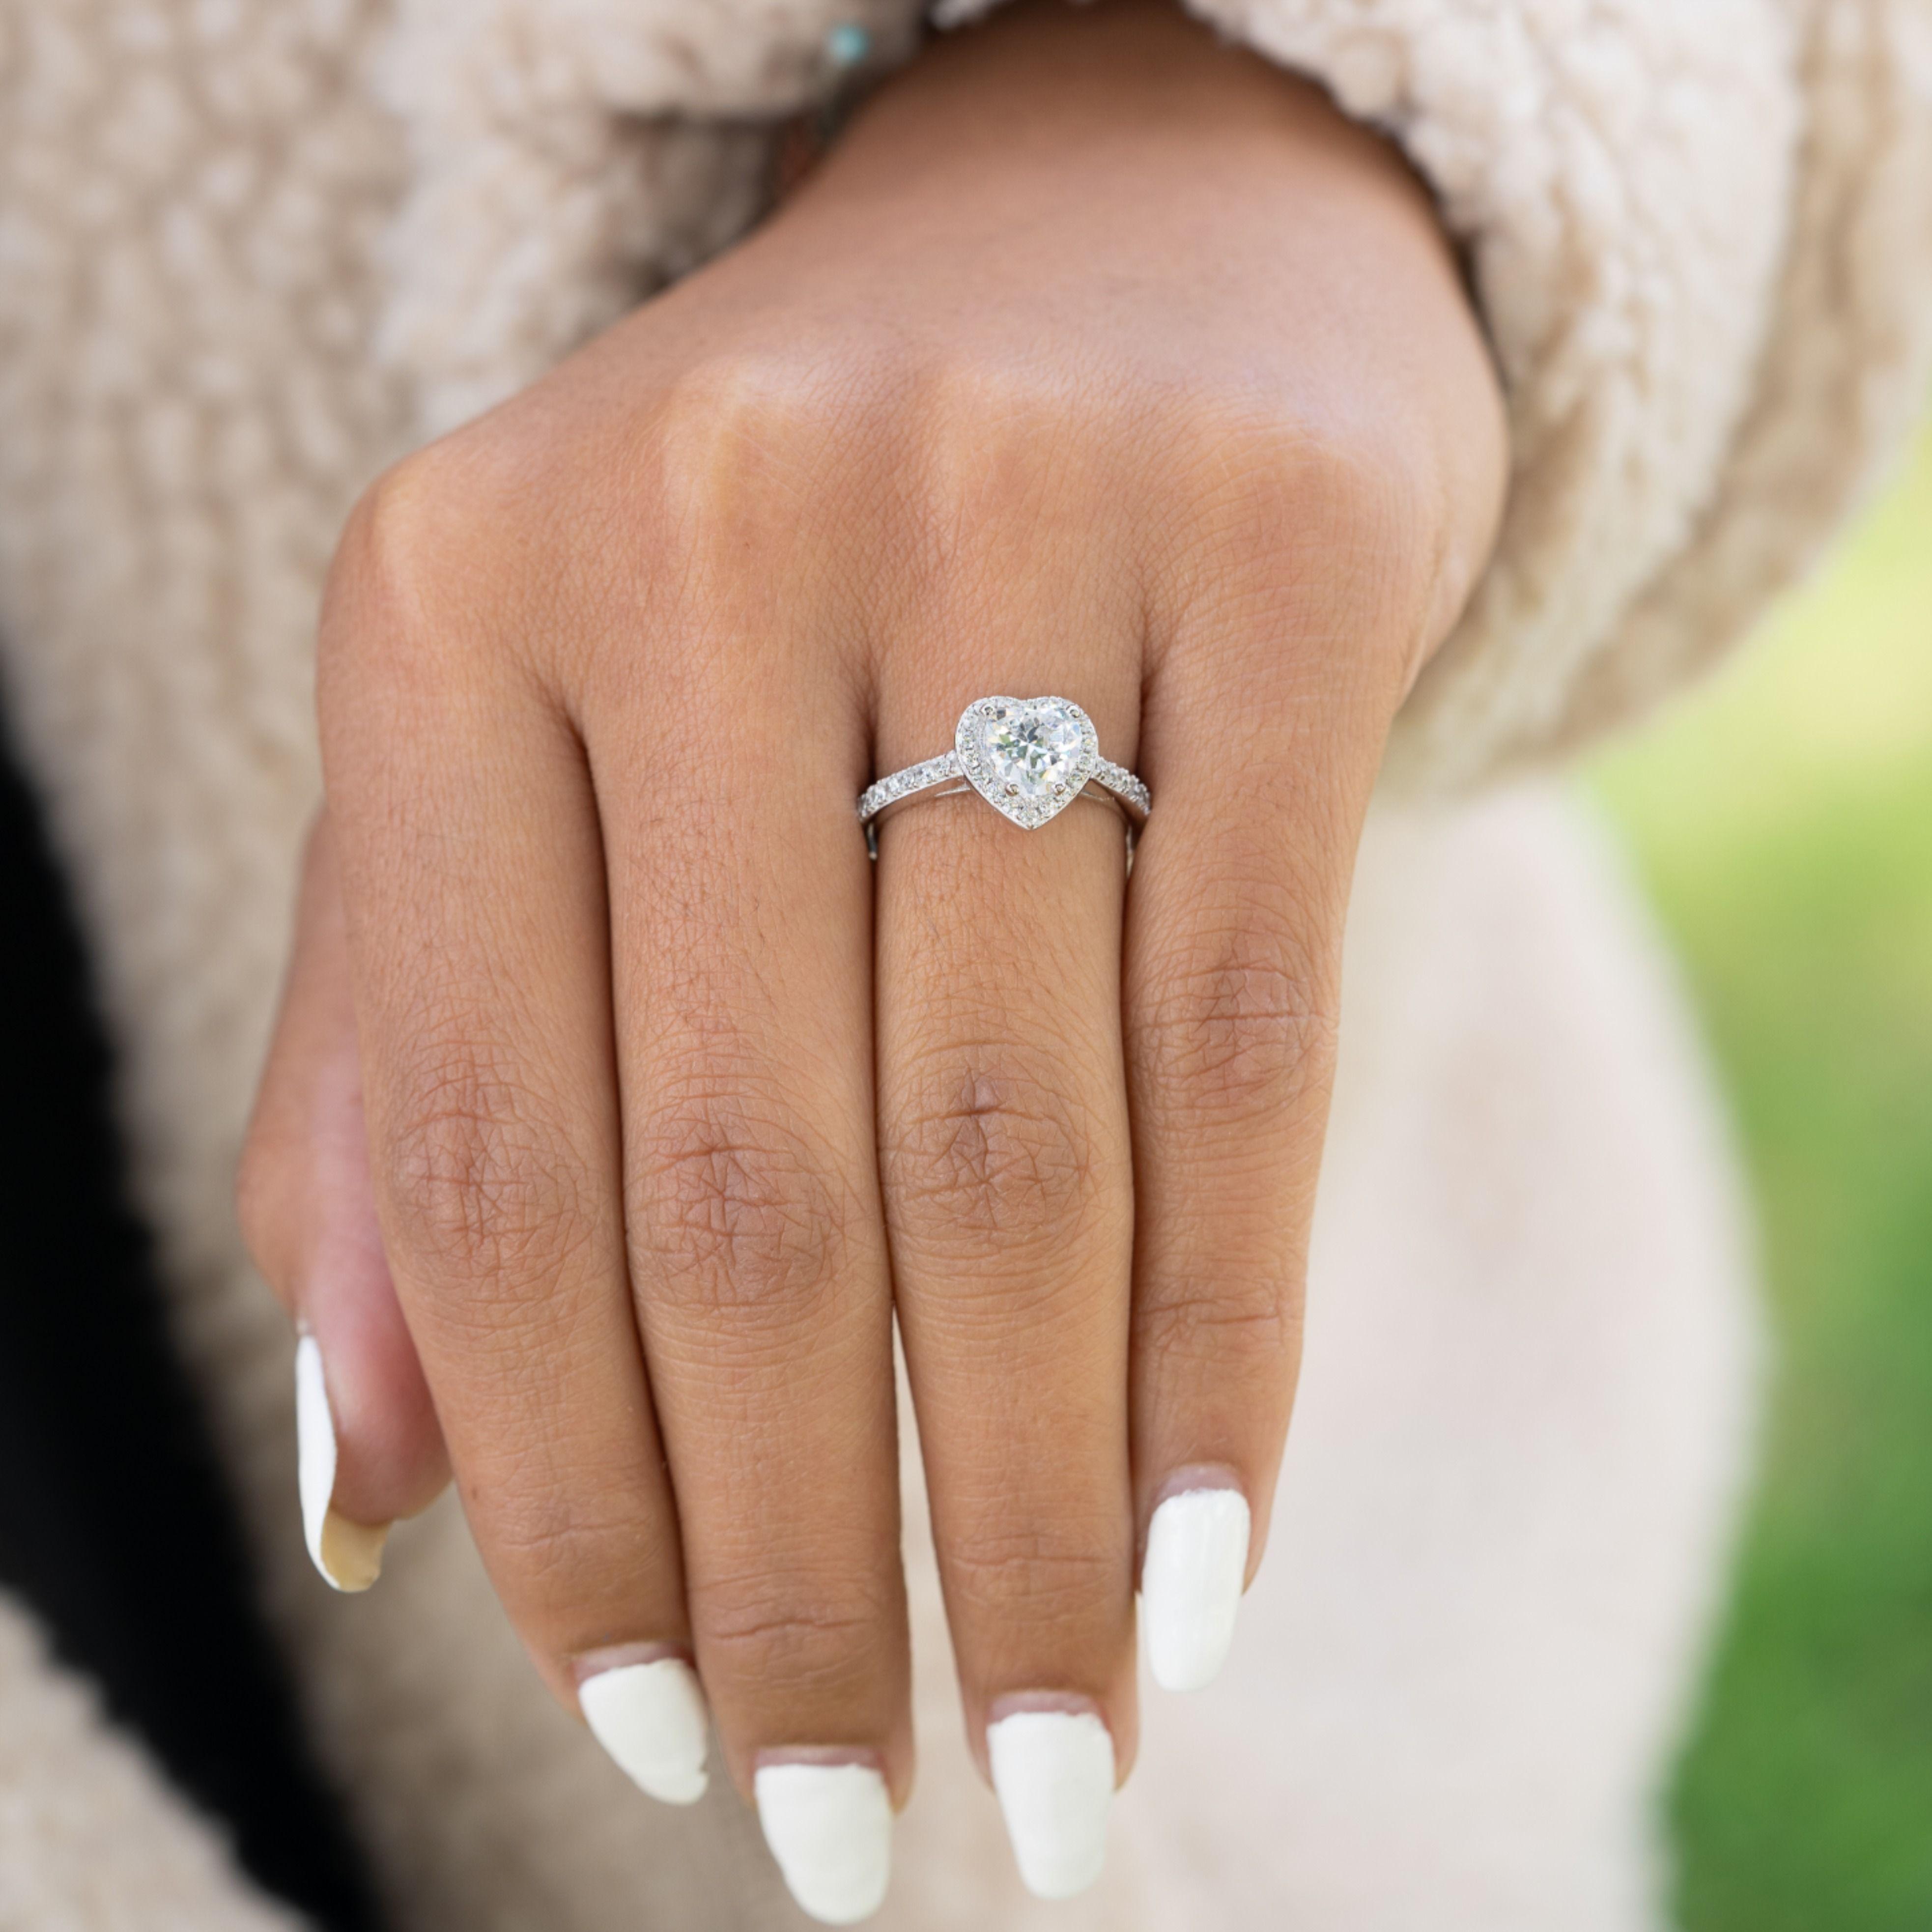 Inexpensive Women S Wedding Rings Heart Shaped Wedding Ring In 2020 Heart Shaped Engagement Rings Heart Shaped Wedding Rings Heart Engagement Rings